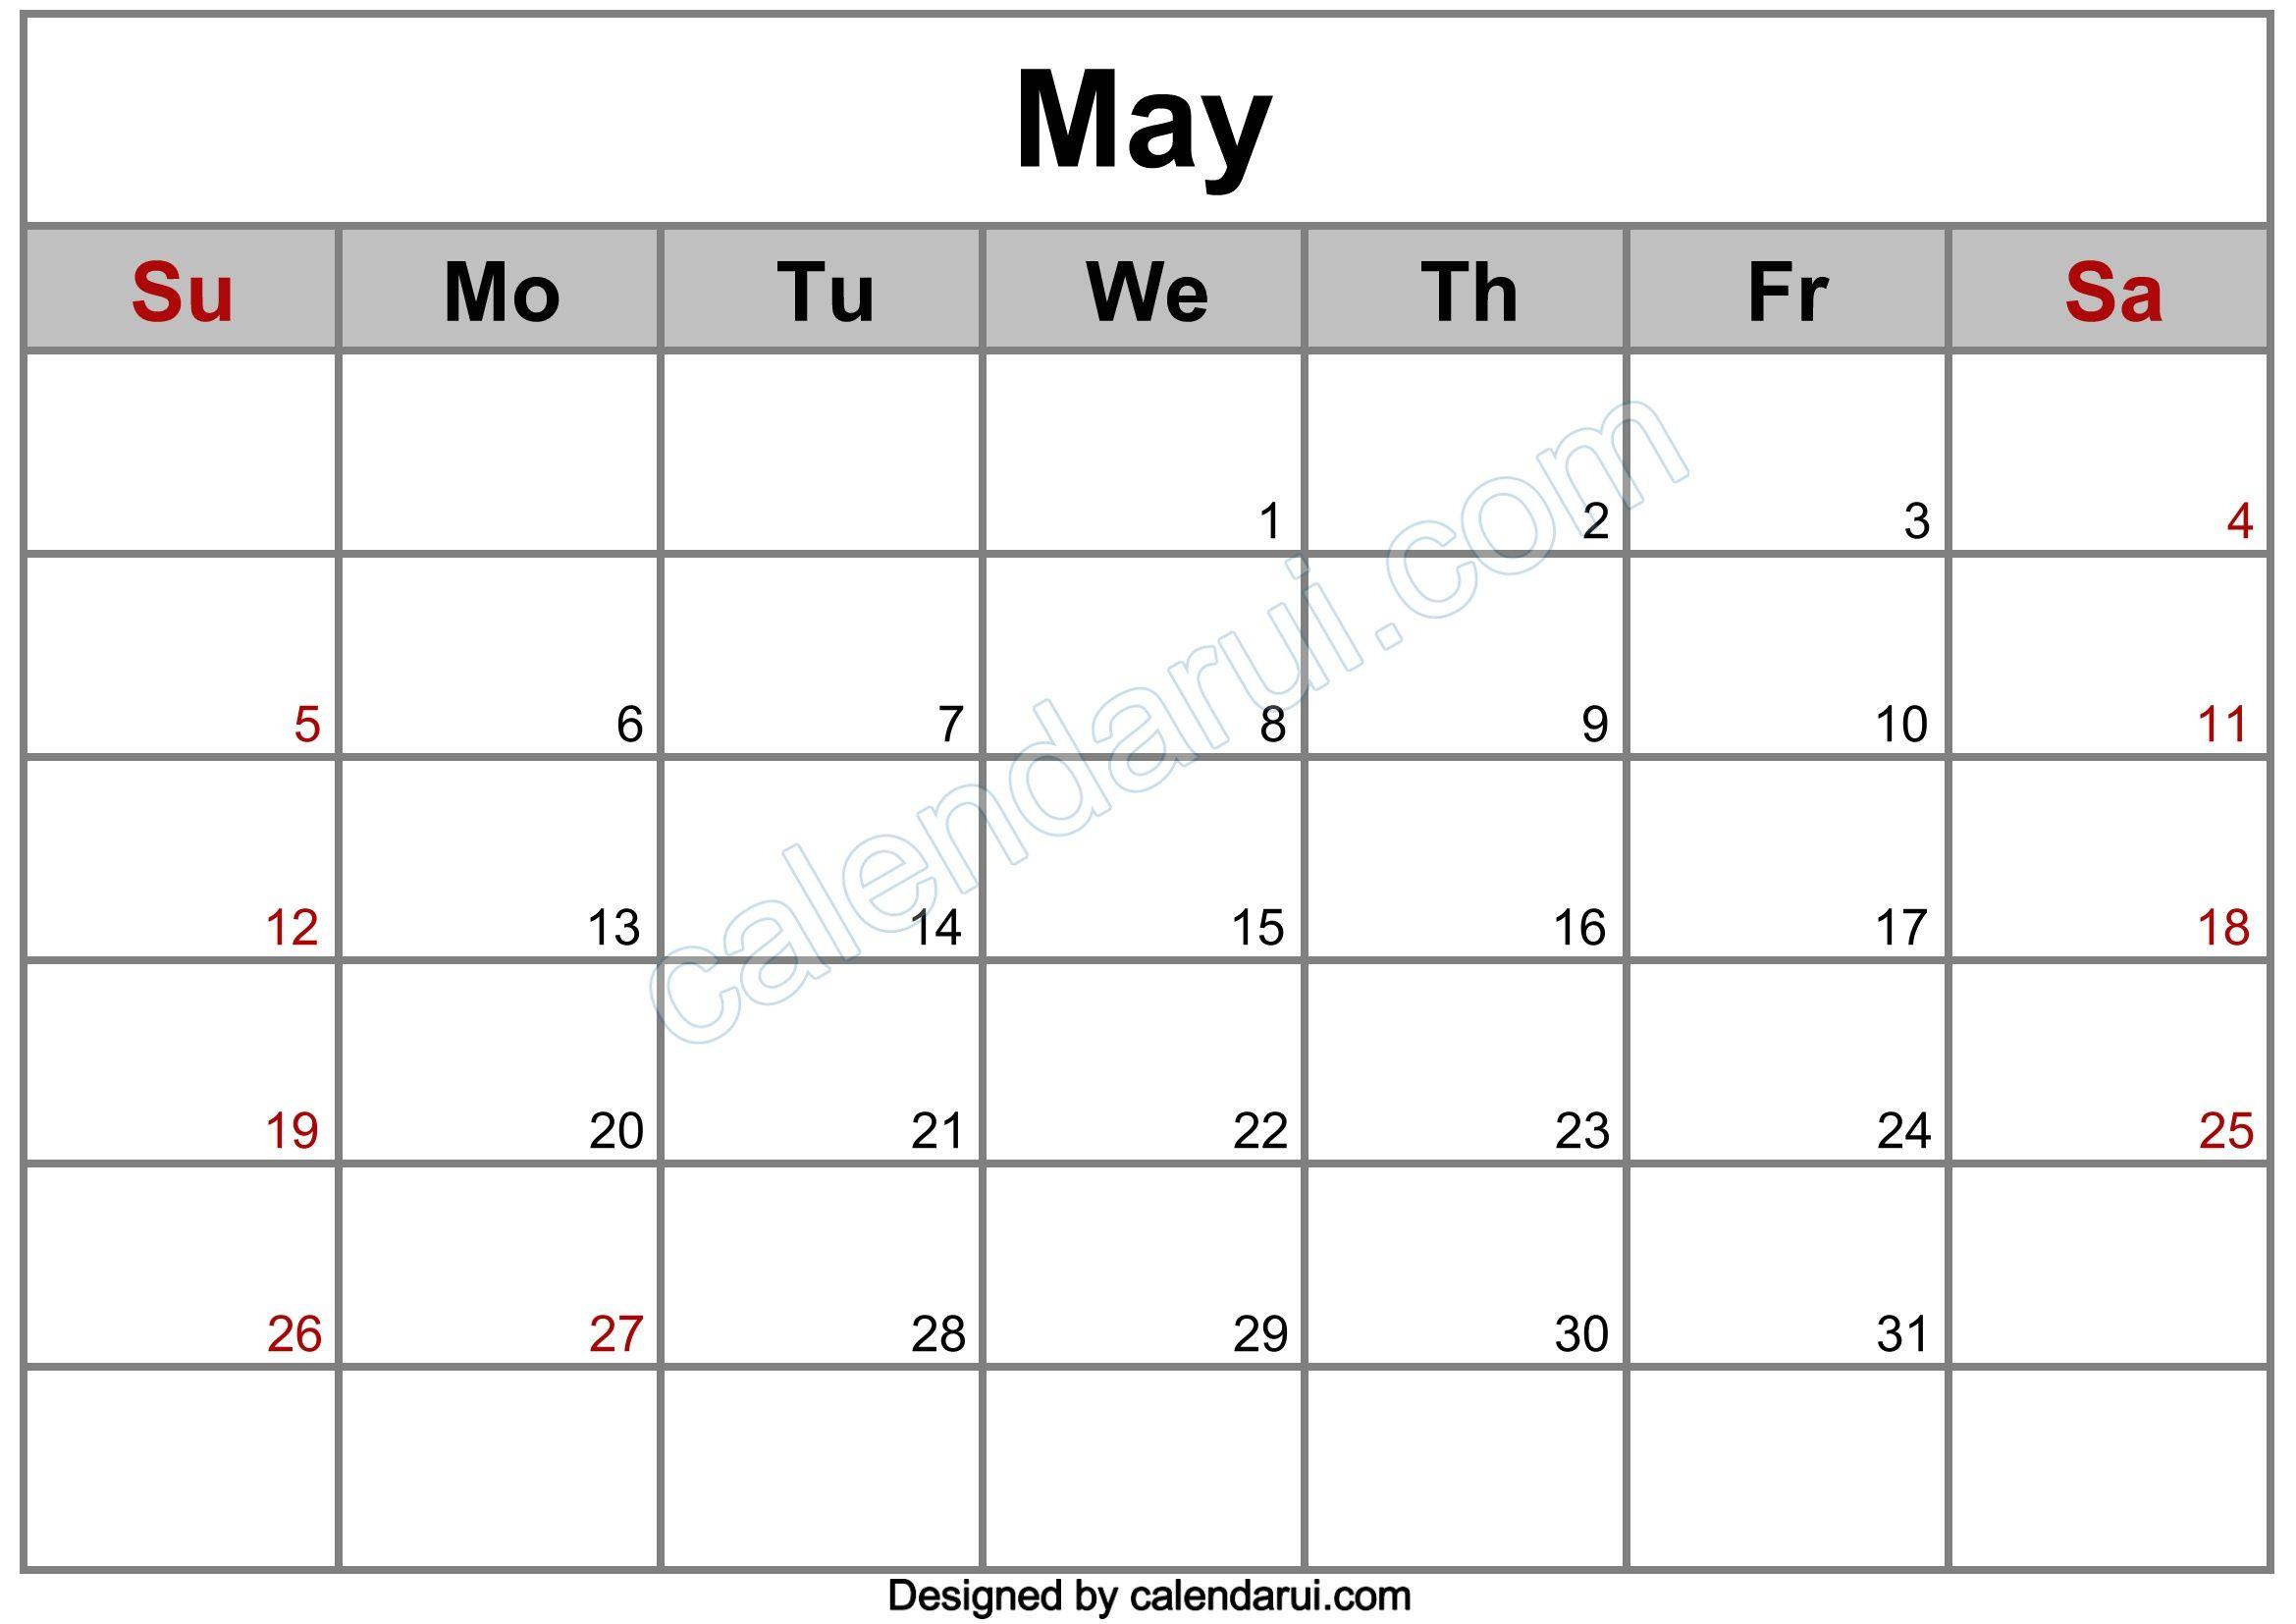 5 May Blank Calendar Template Example